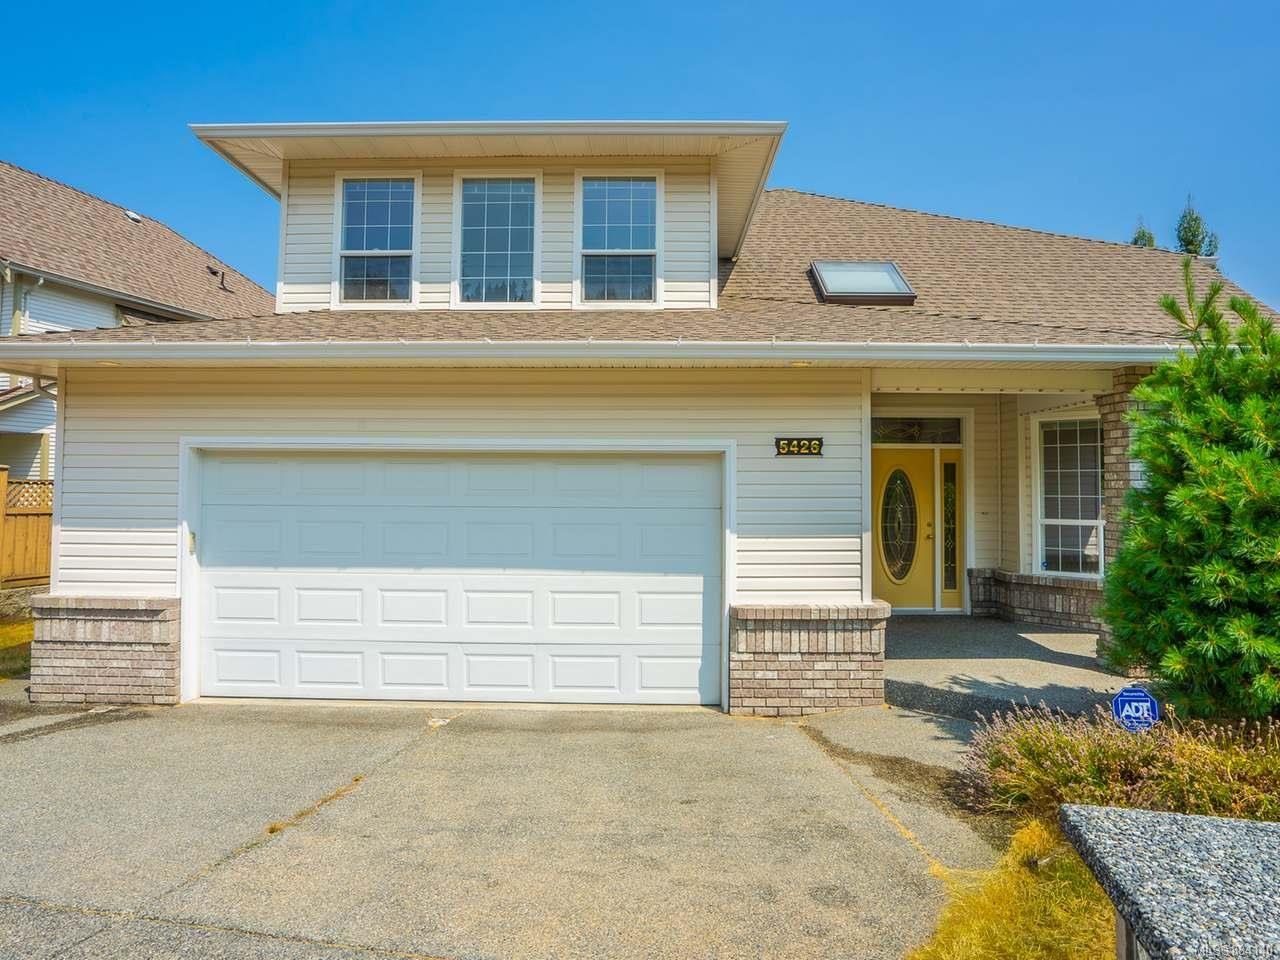 Main Photo: 5426 Leslie Cres in : Na North Nanaimo House for sale (Nanaimo)  : MLS®# 884140